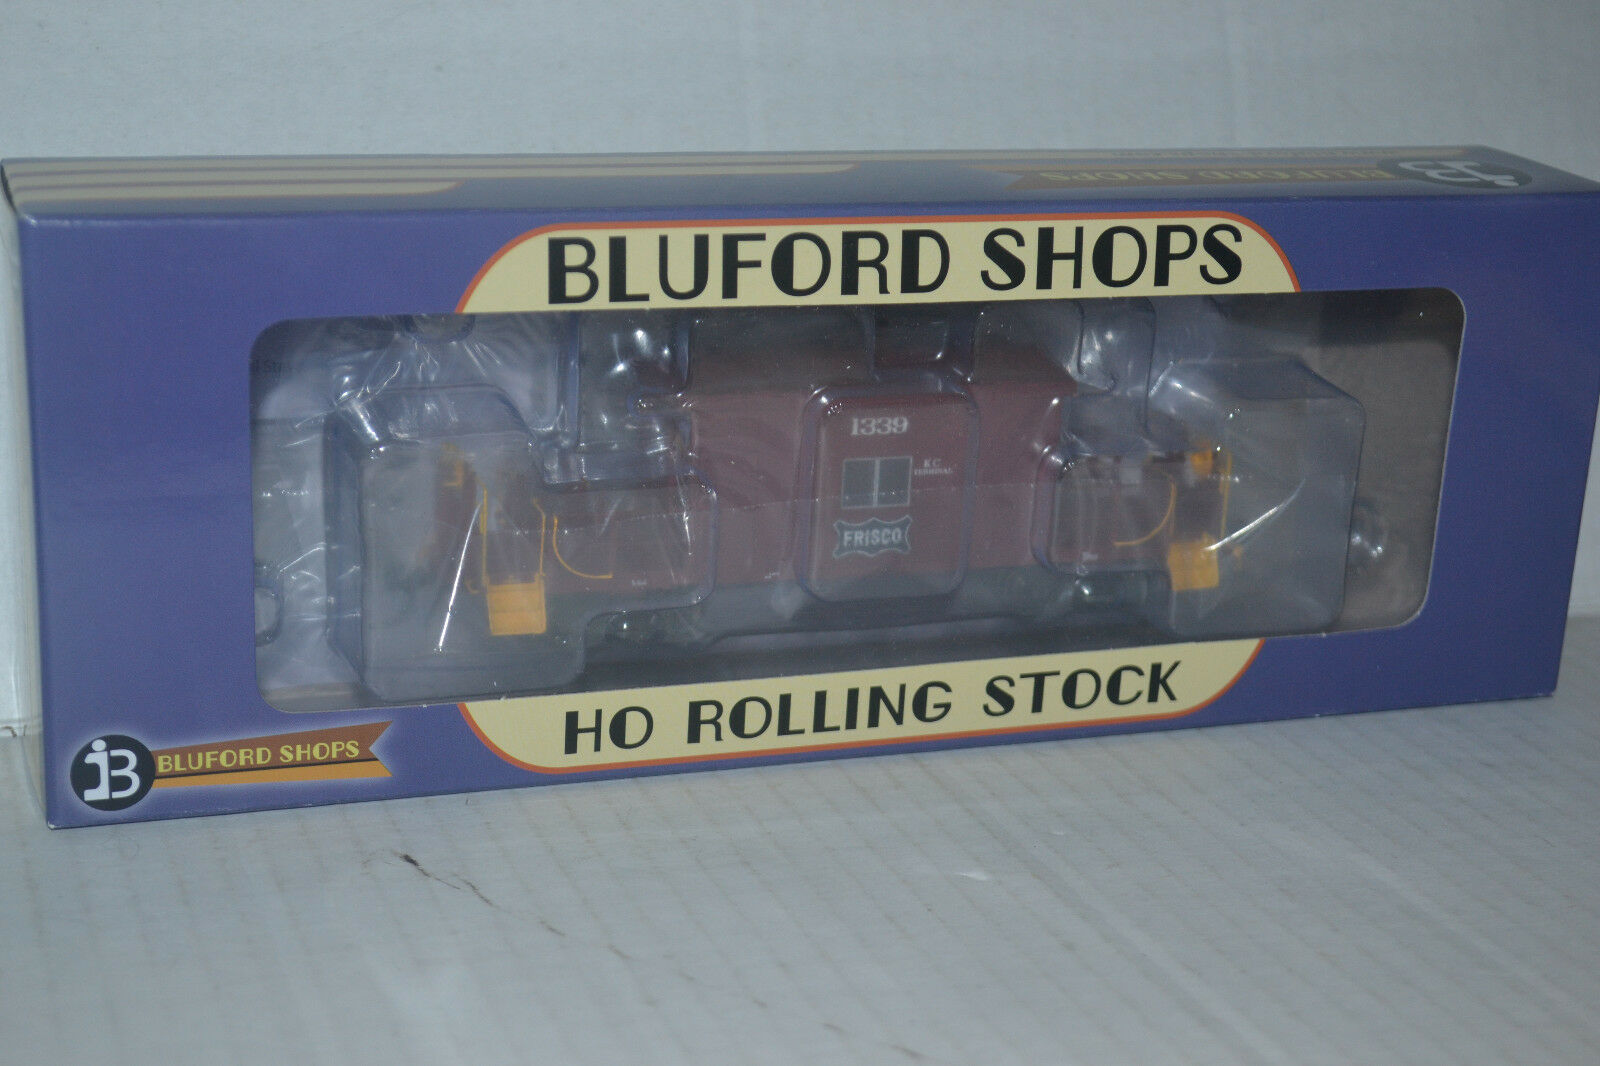 Bluford negozios 34191 Frisco Short Roof Transfer Caboose Ho Scale